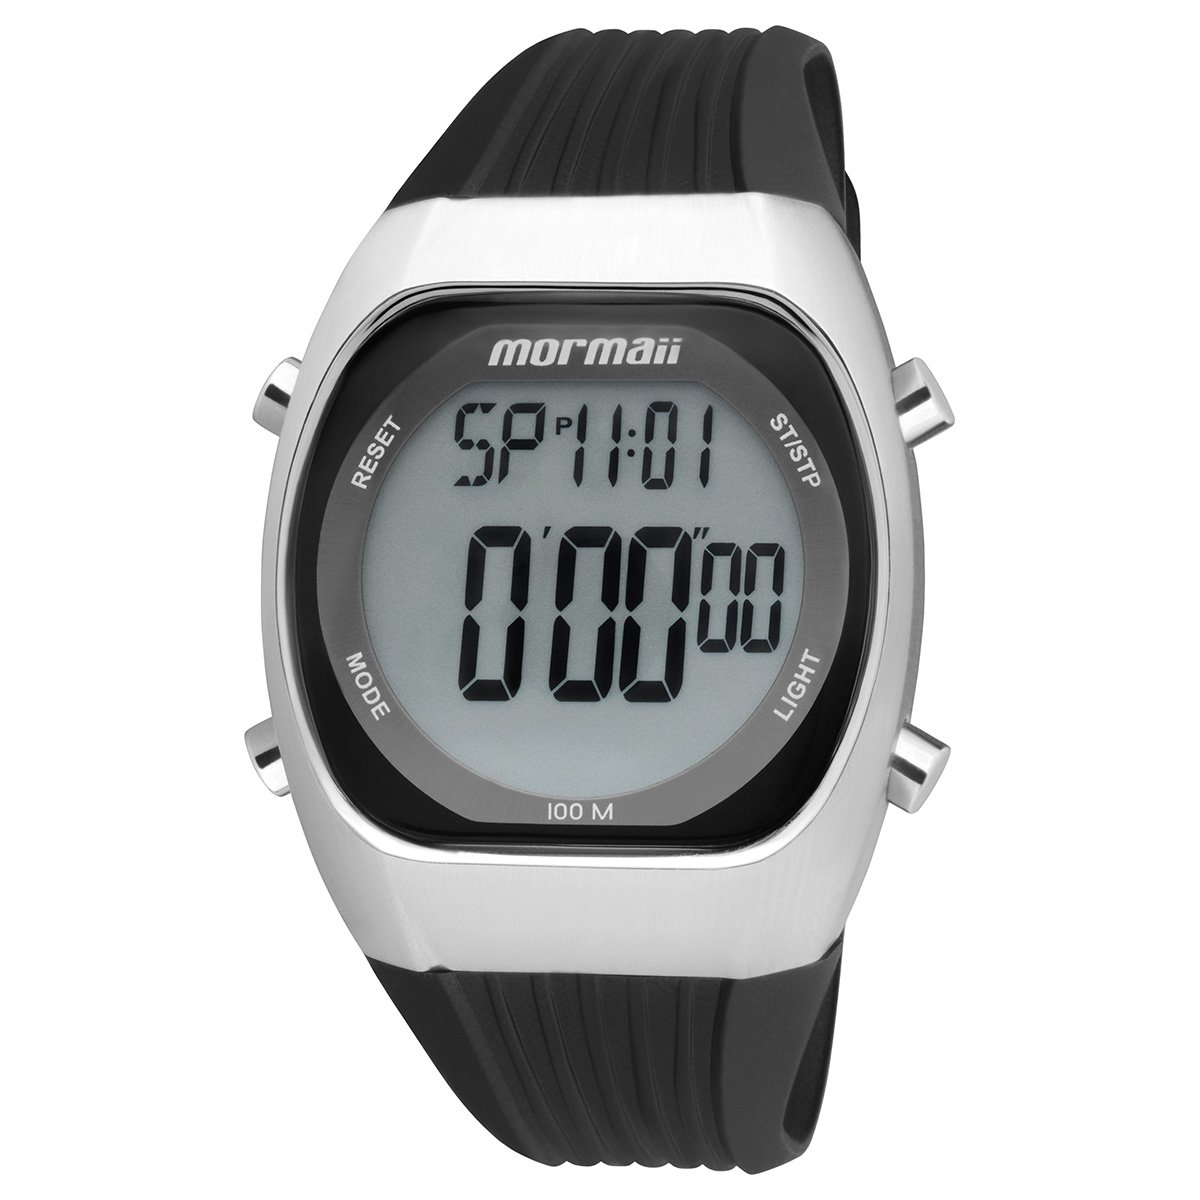 4b98d4262d1 Relógio Mormaii Y11099 8P Masculino - Preto - Compre Agora